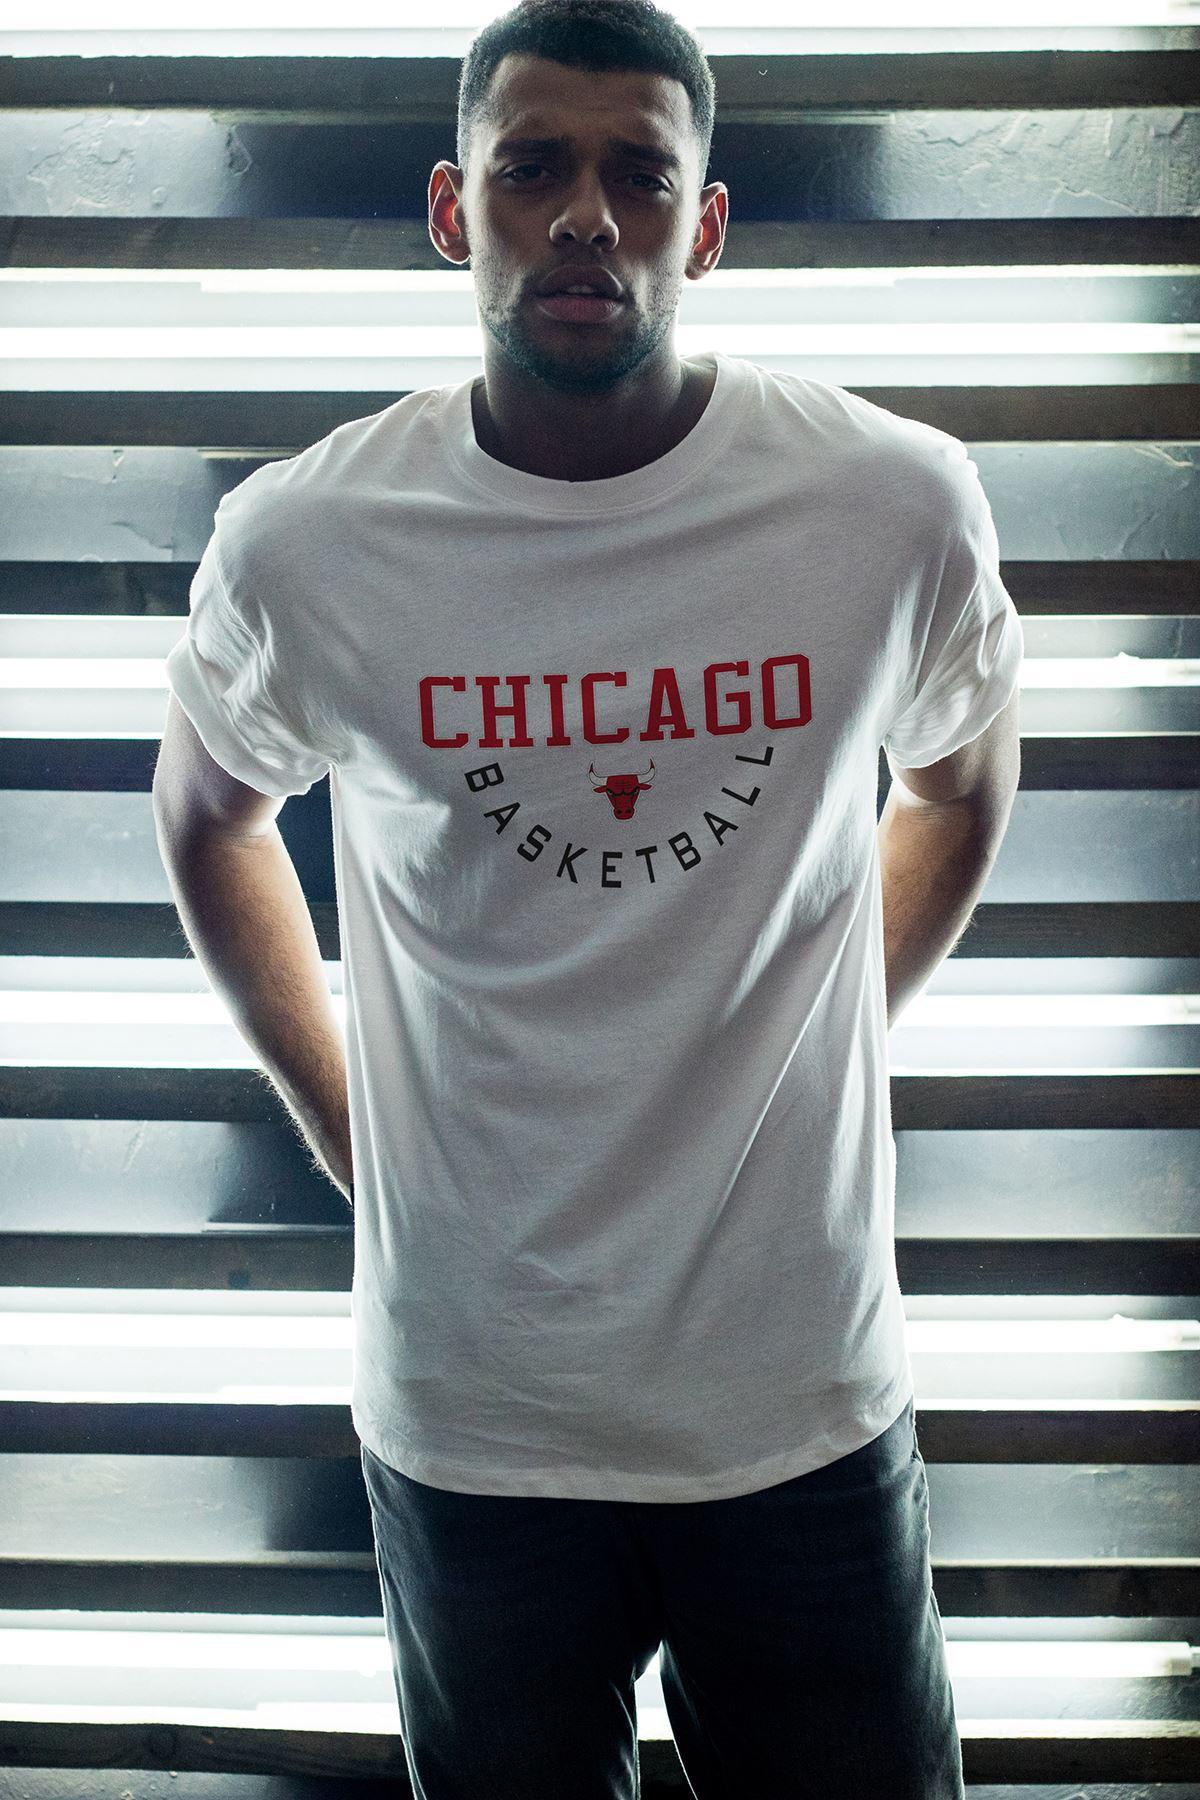 Chicago Bulls 36 Beyaz Erkek Oversize Tshirt - Tişört